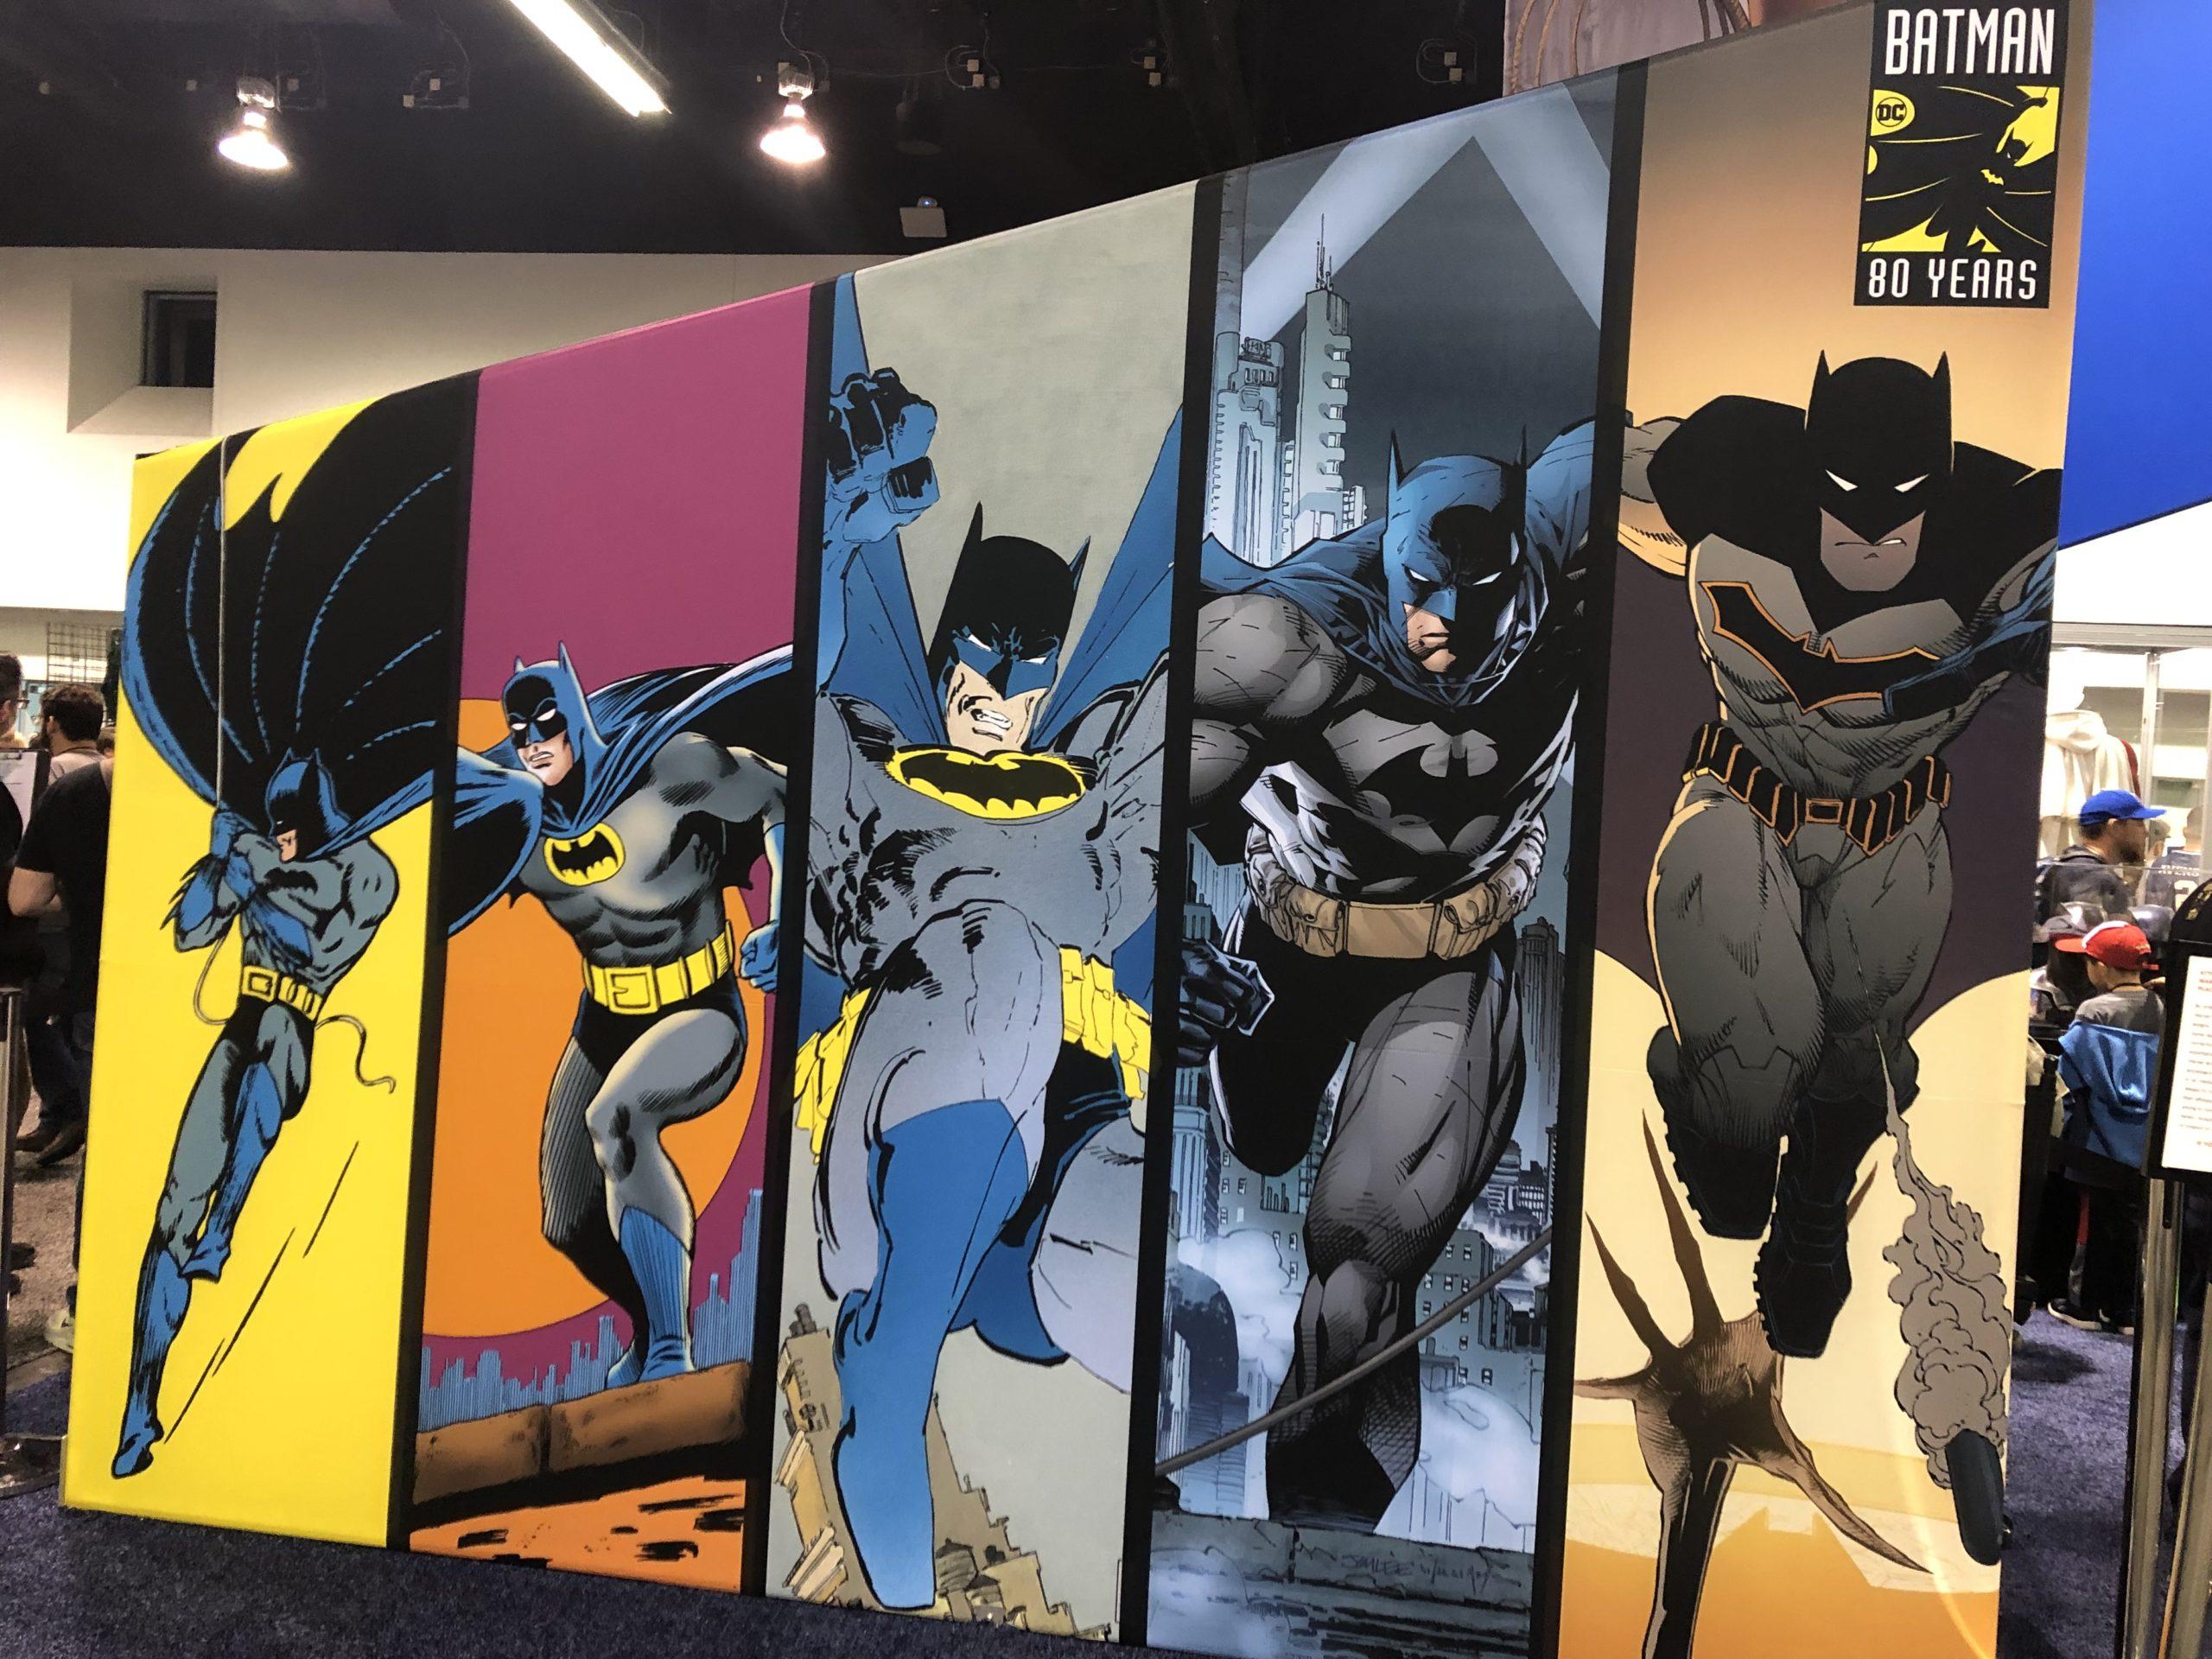 80 Years of Batman at WonderCon 2019. Photo: Danny Pham/dorkaholics.